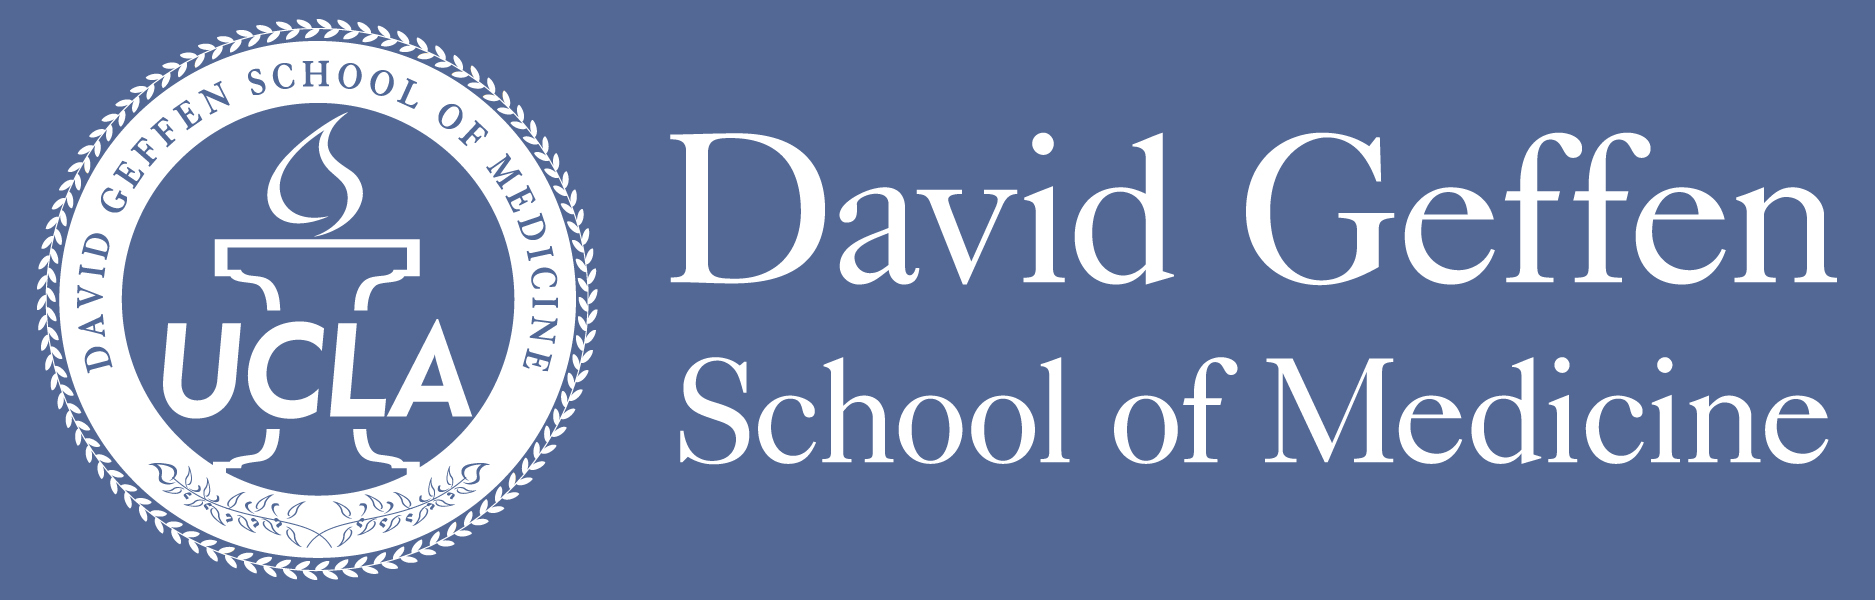 david geffen school of medicine at ucla 171 logos amp brands